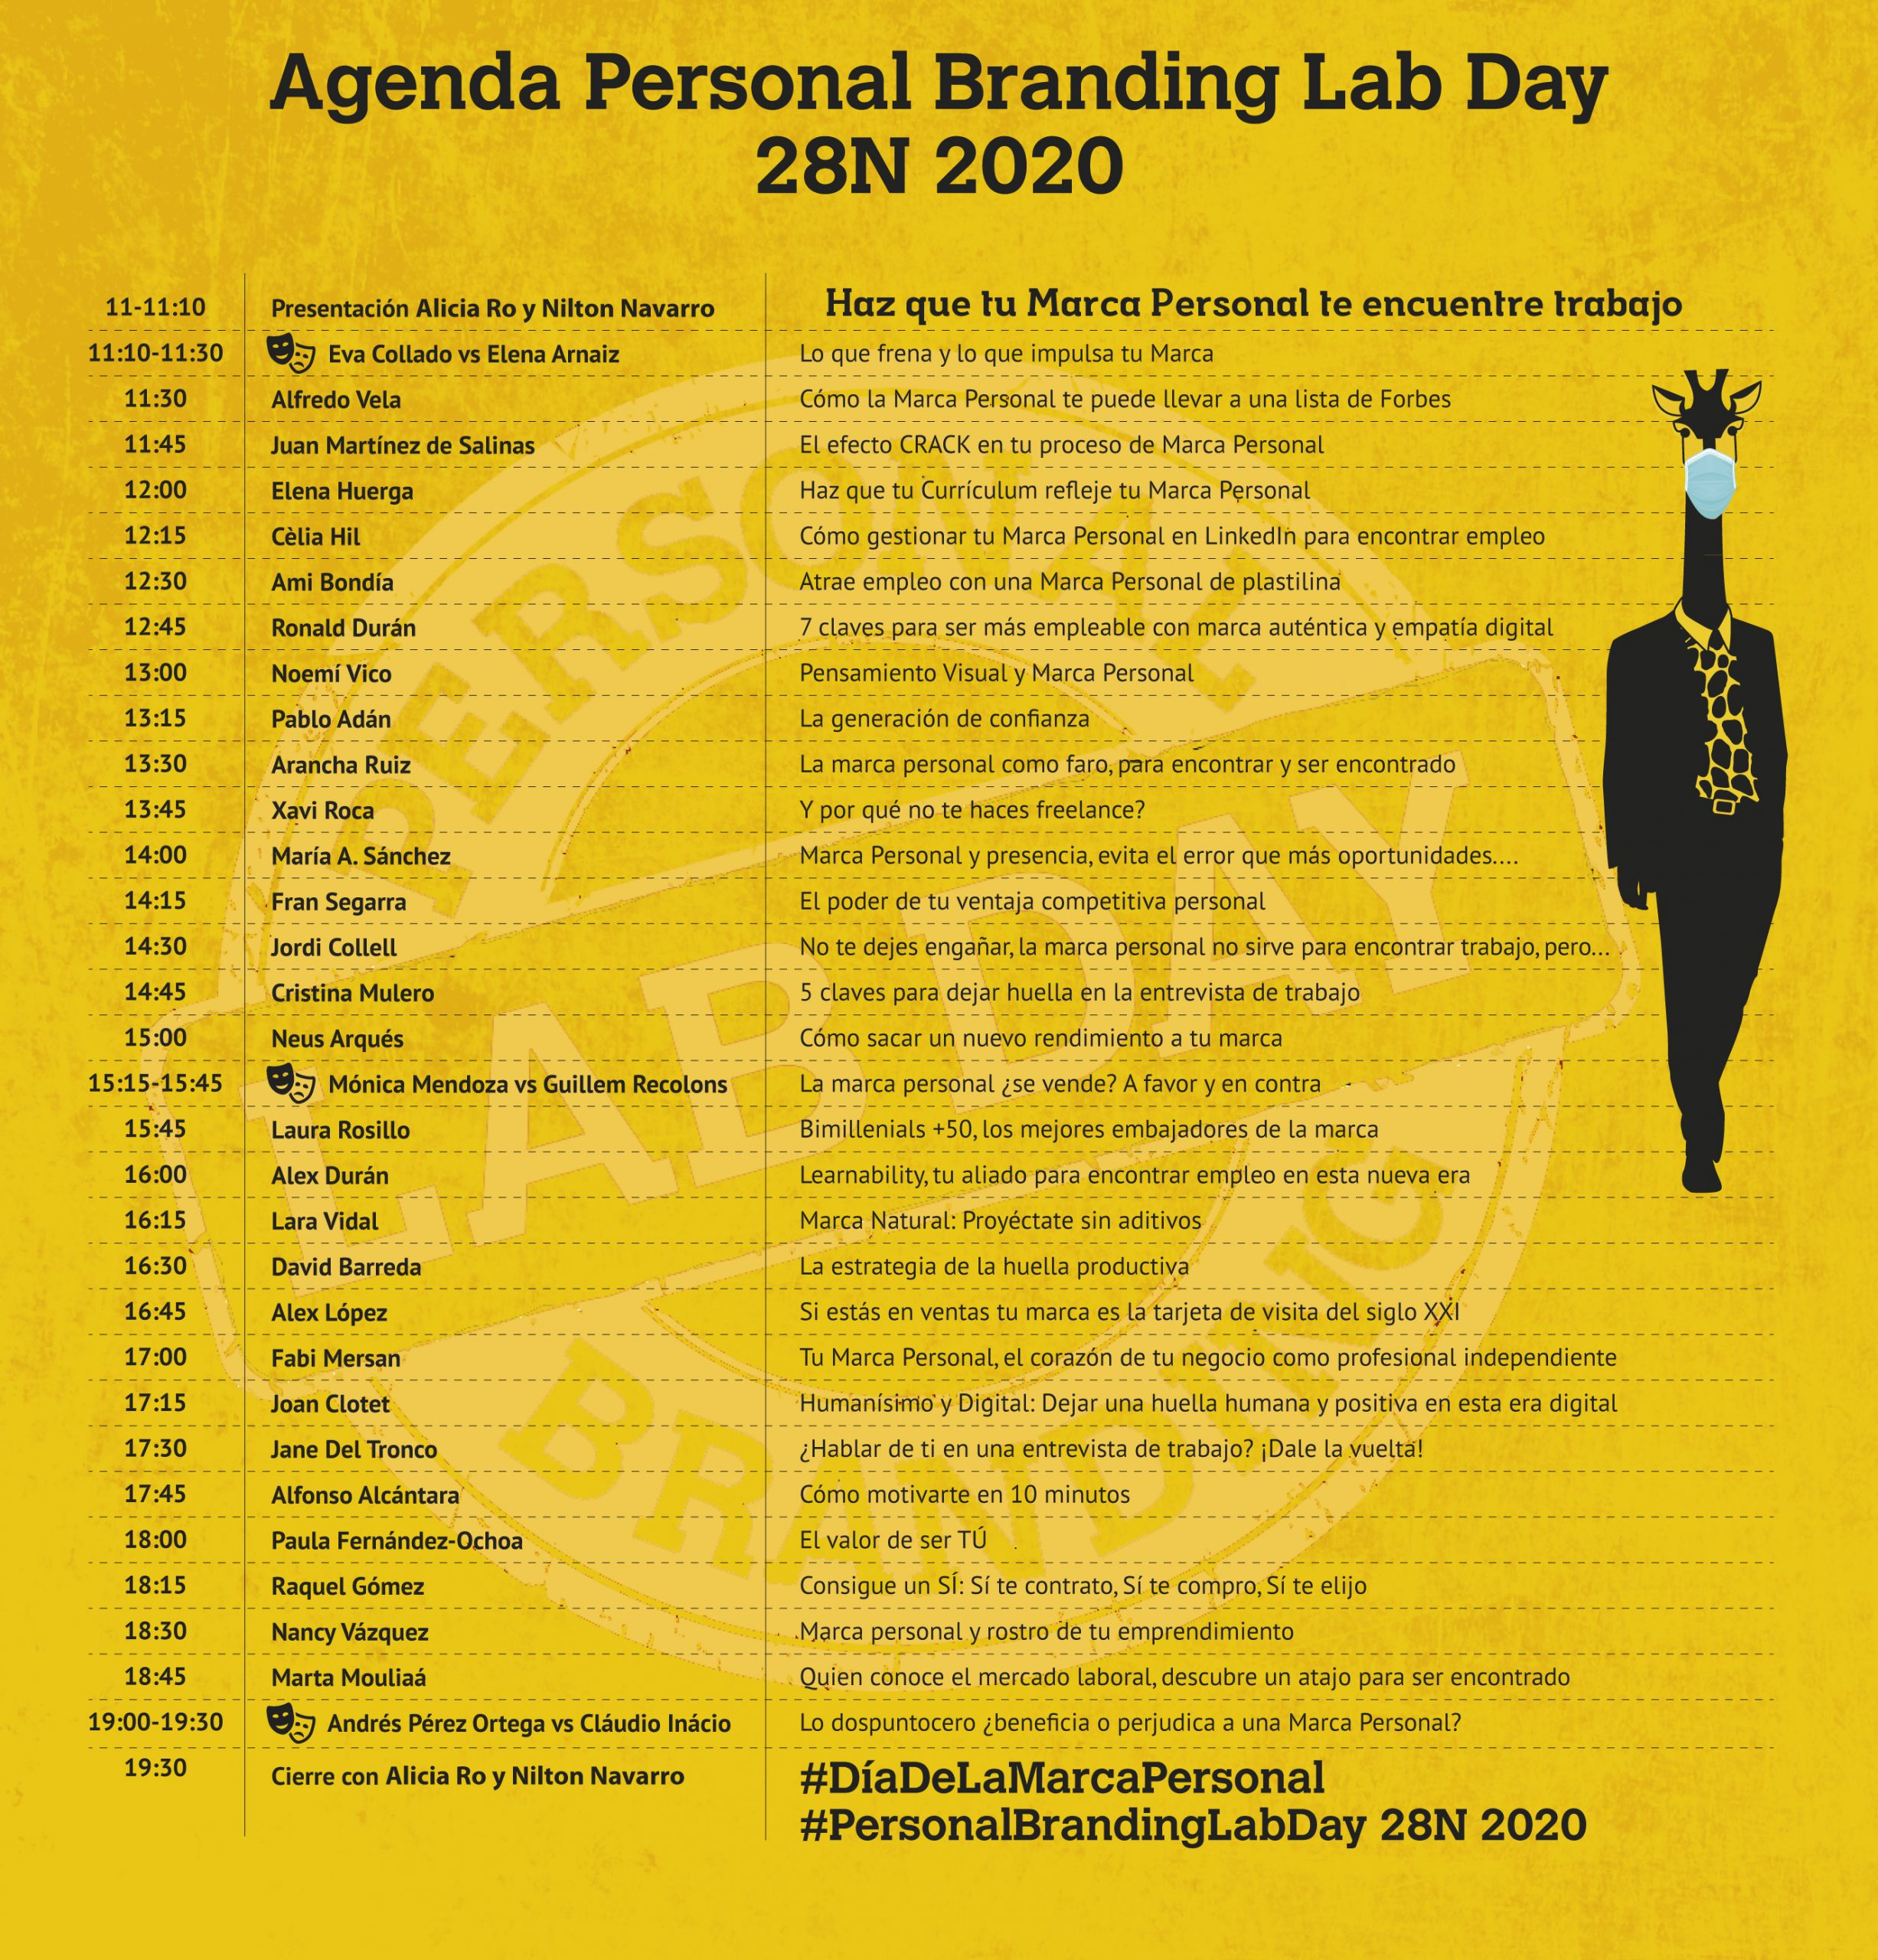 Agenda 28N Personal Branding LabDay 2020